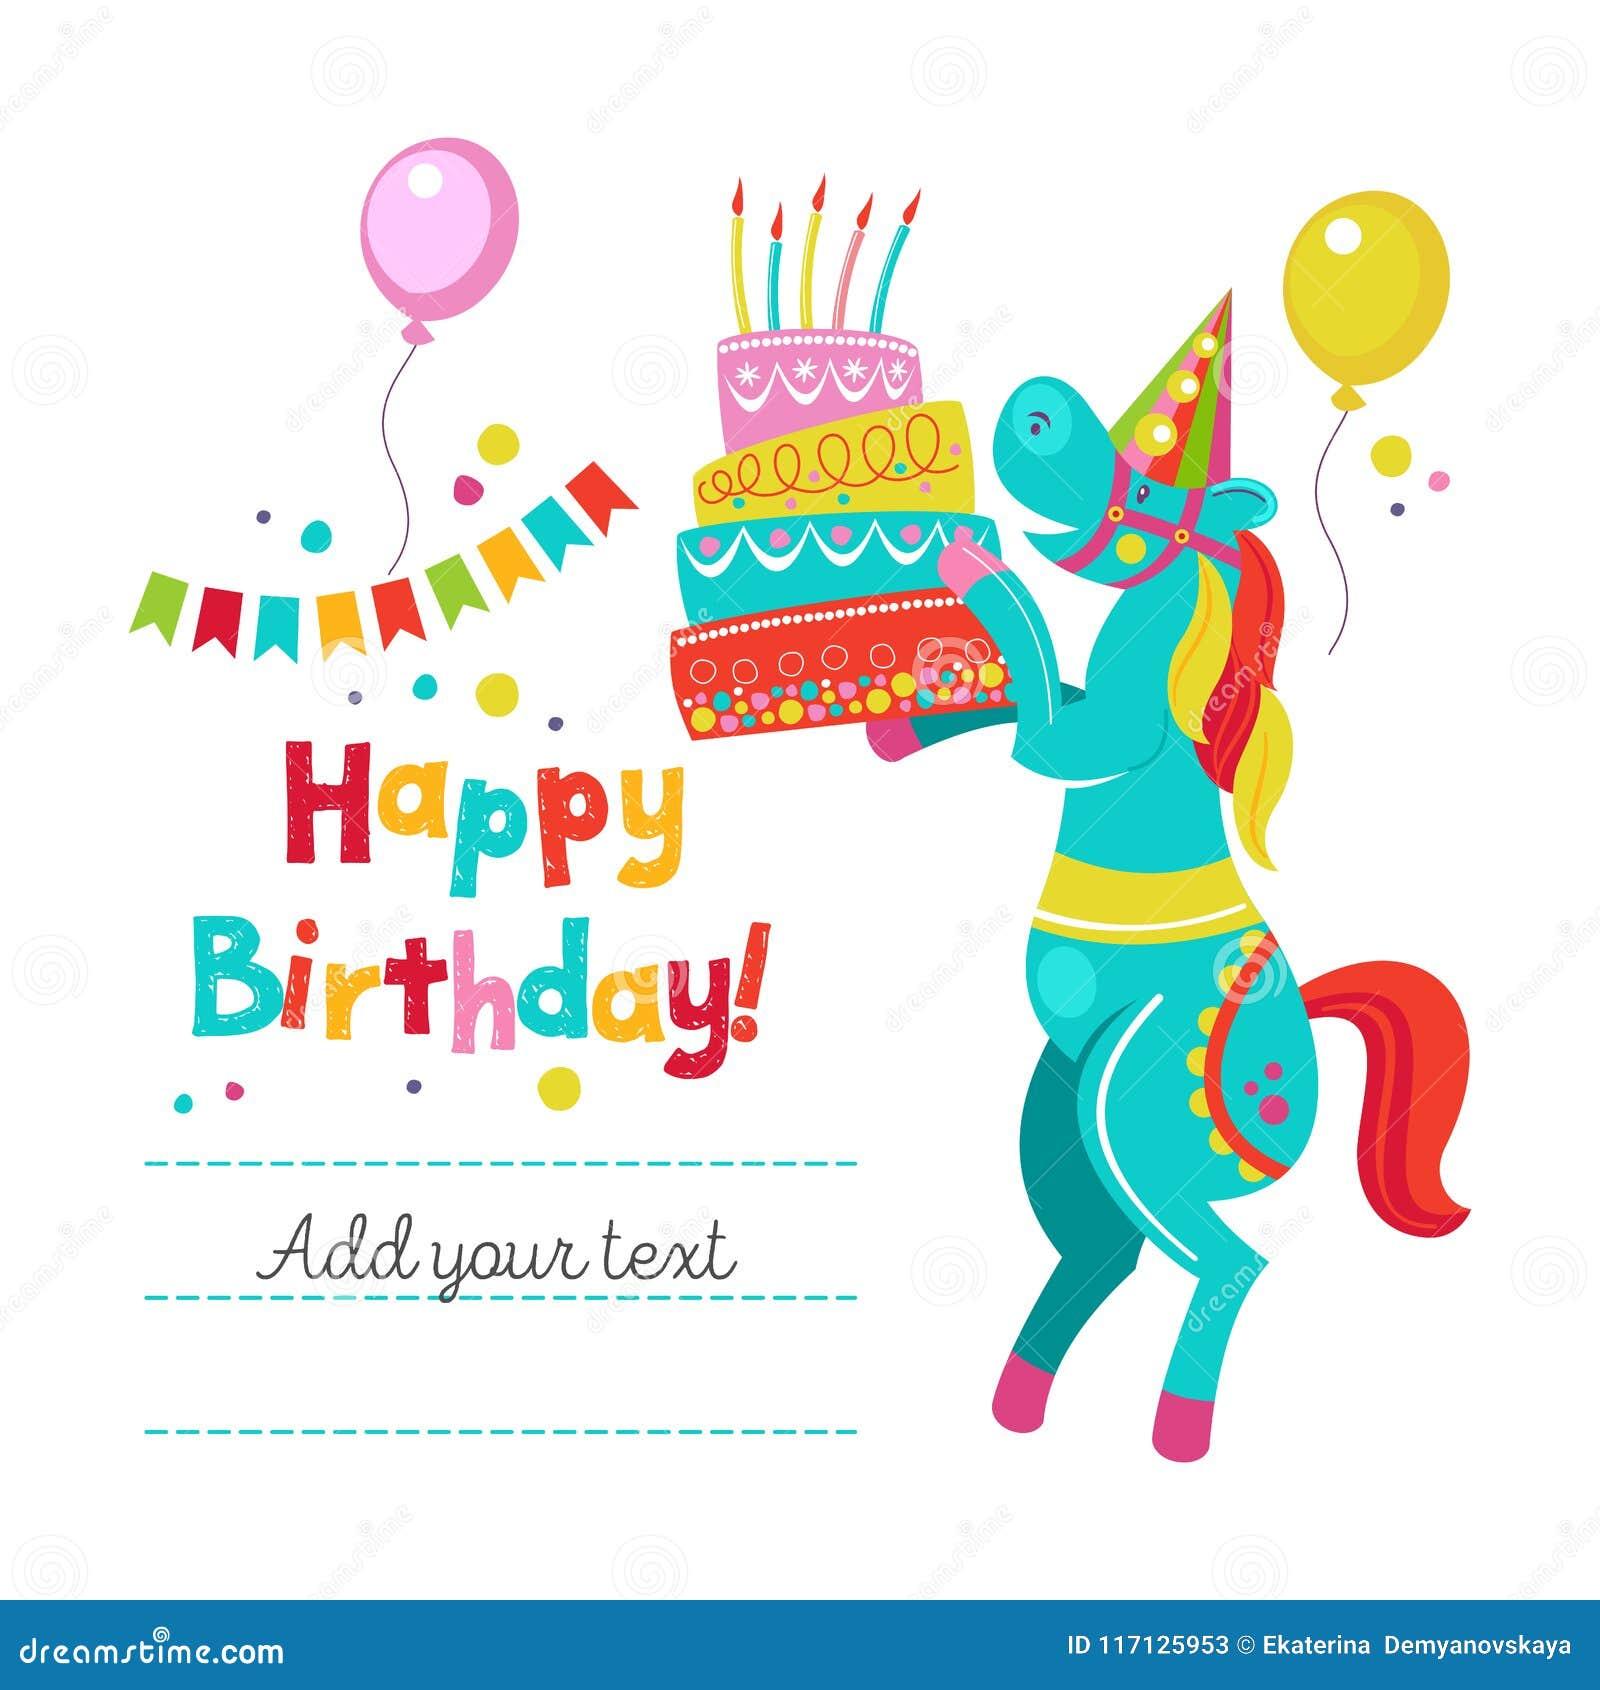 Happy Birthday Vector Greeting Card Stock Vector Illustration Of Design Cute 117125953